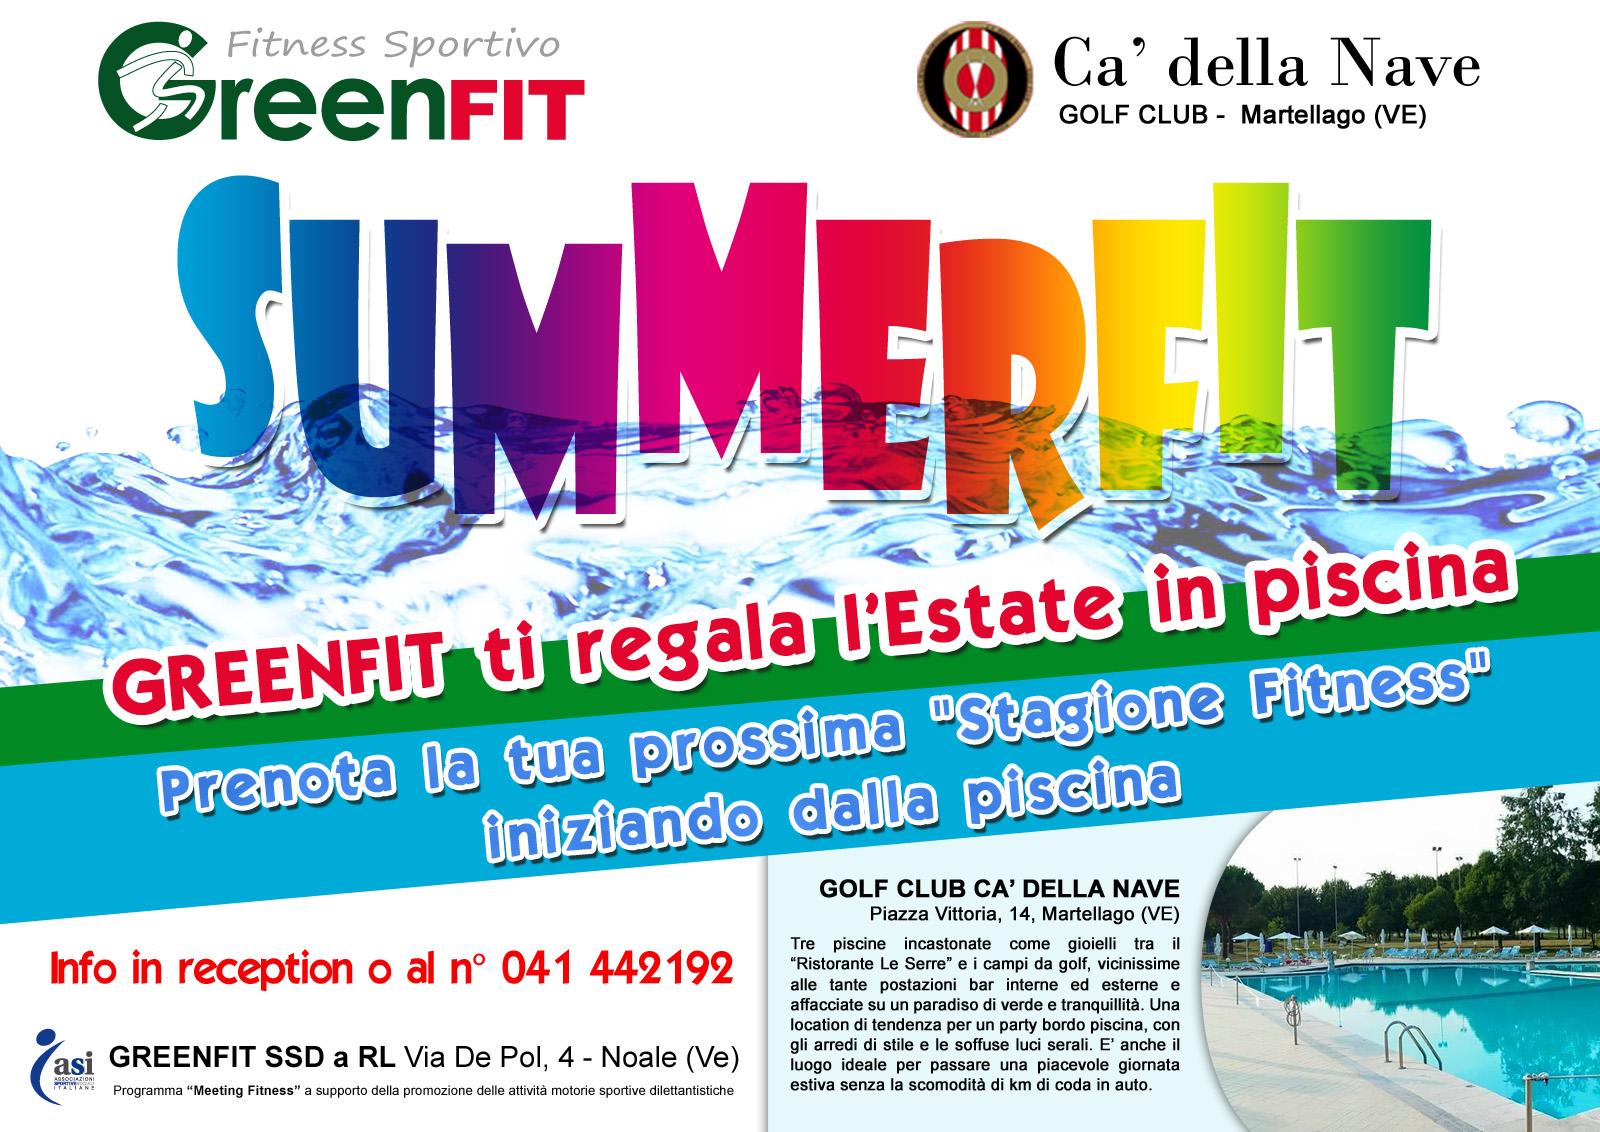 Greenfit Fitness Sportivo Noale